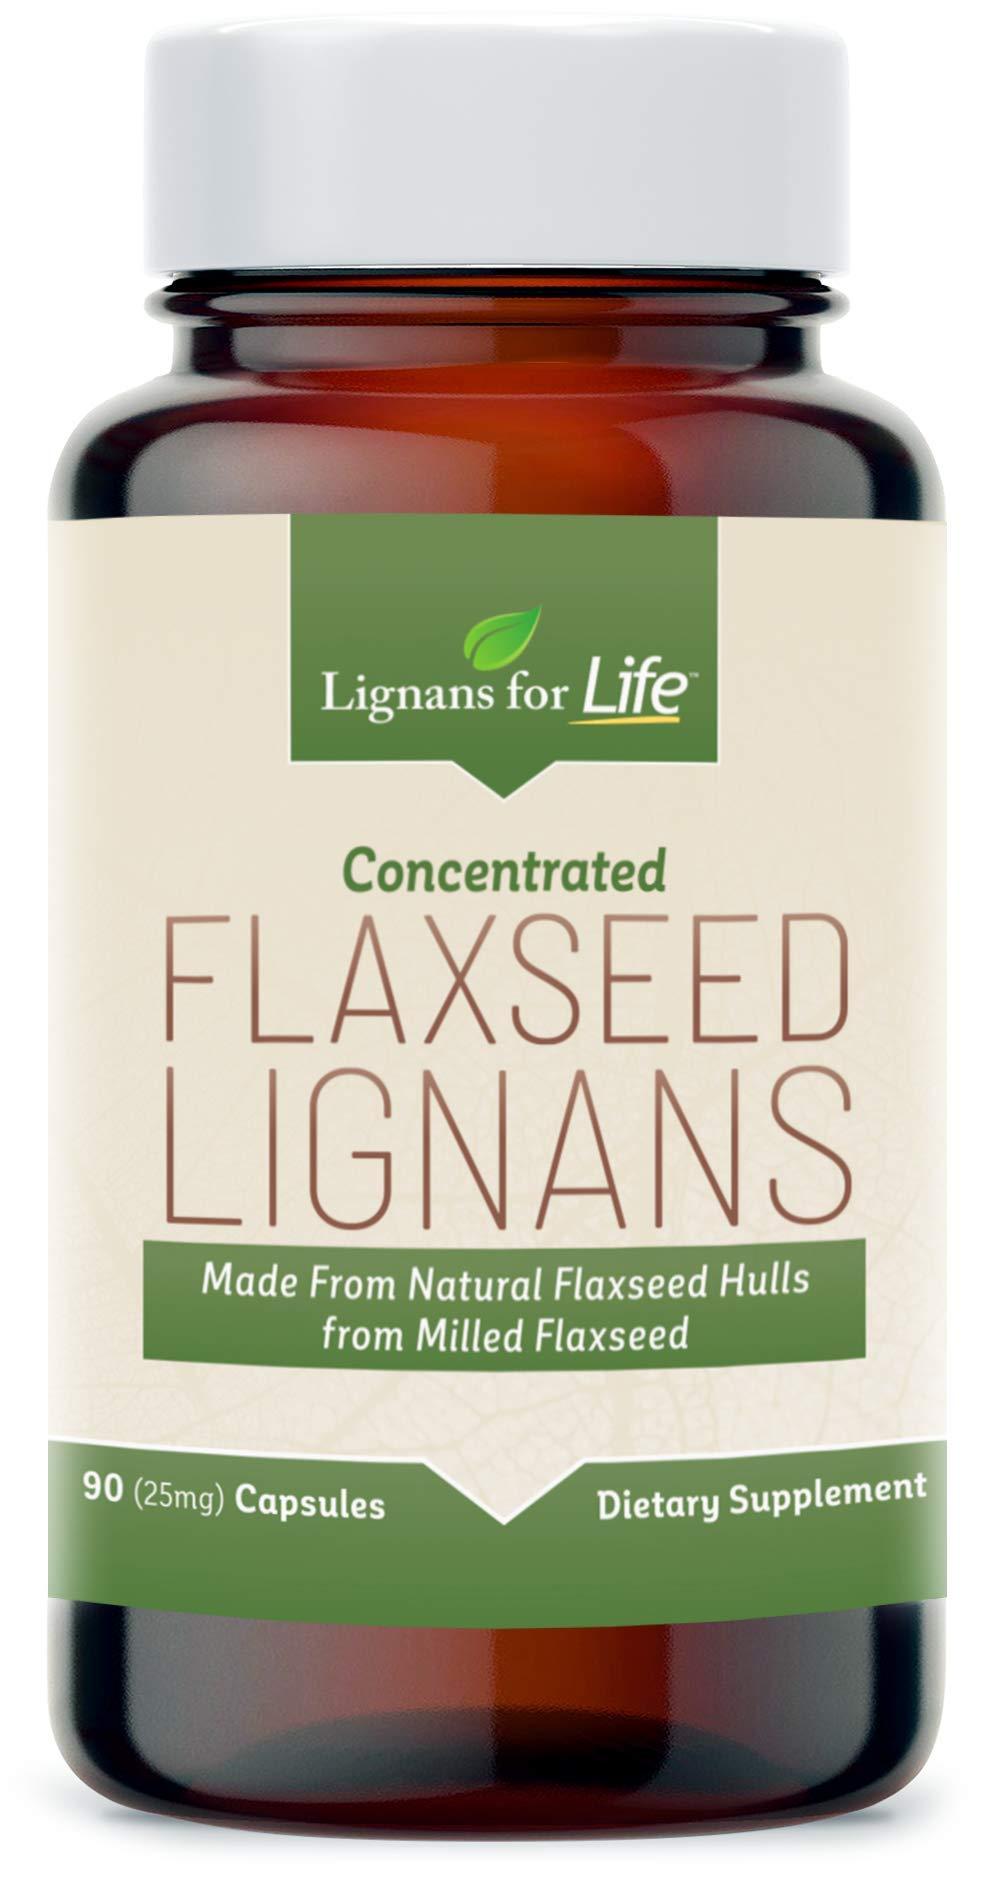 Lignans for LifeFlaxseed Lignans - Flaxseed Hulls + SDG Lignans from Flaxseed Hulls - 90ct 25mg Capsules